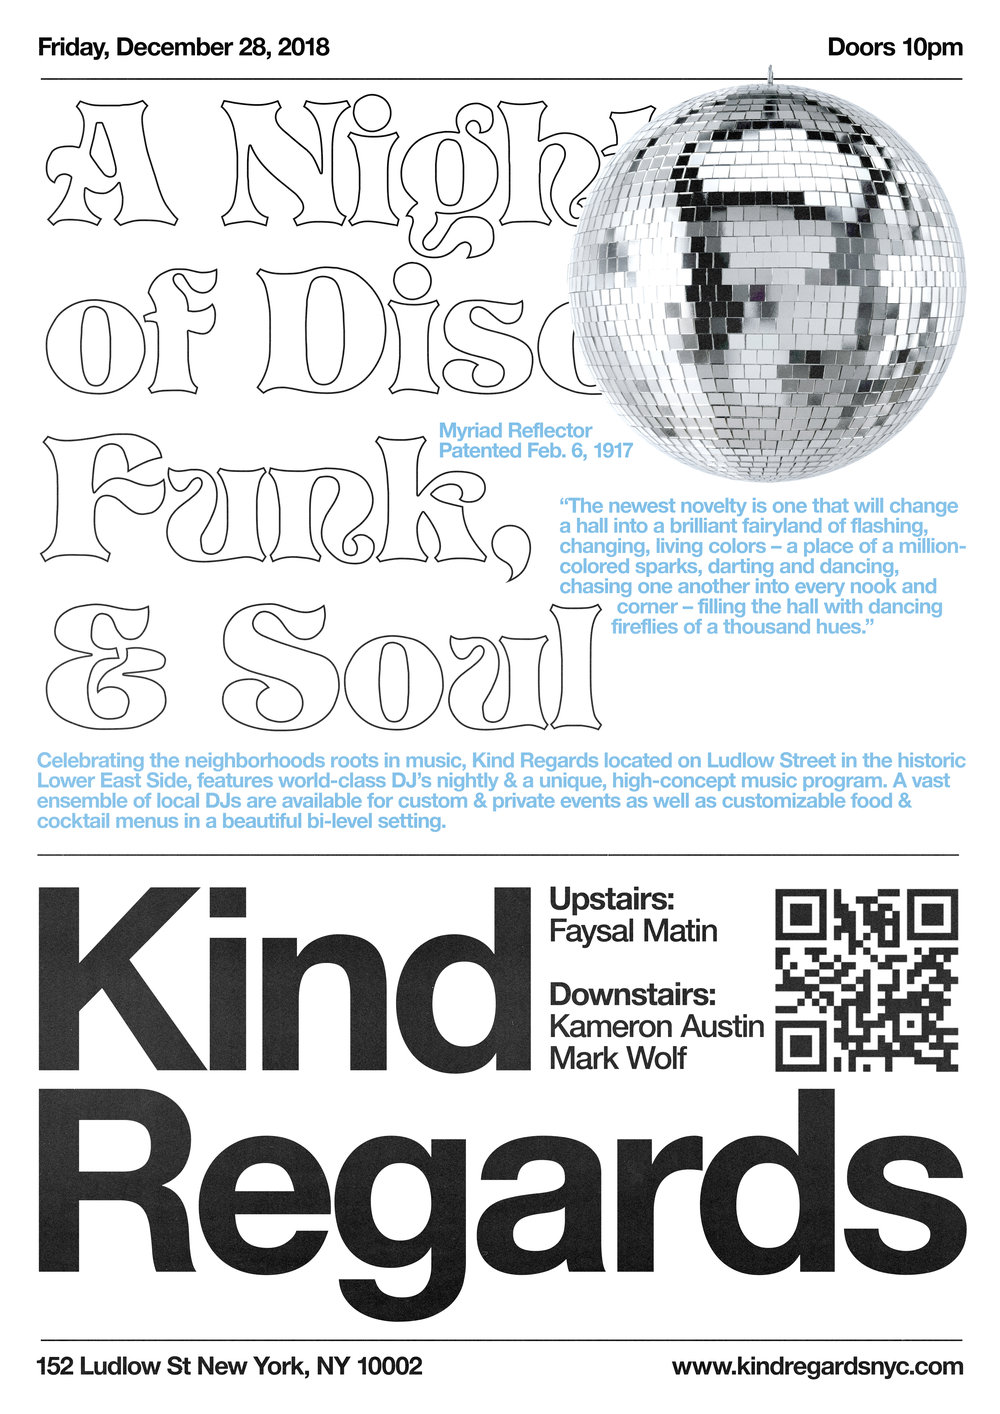 kind regards new poster design 28 w texture.jpg